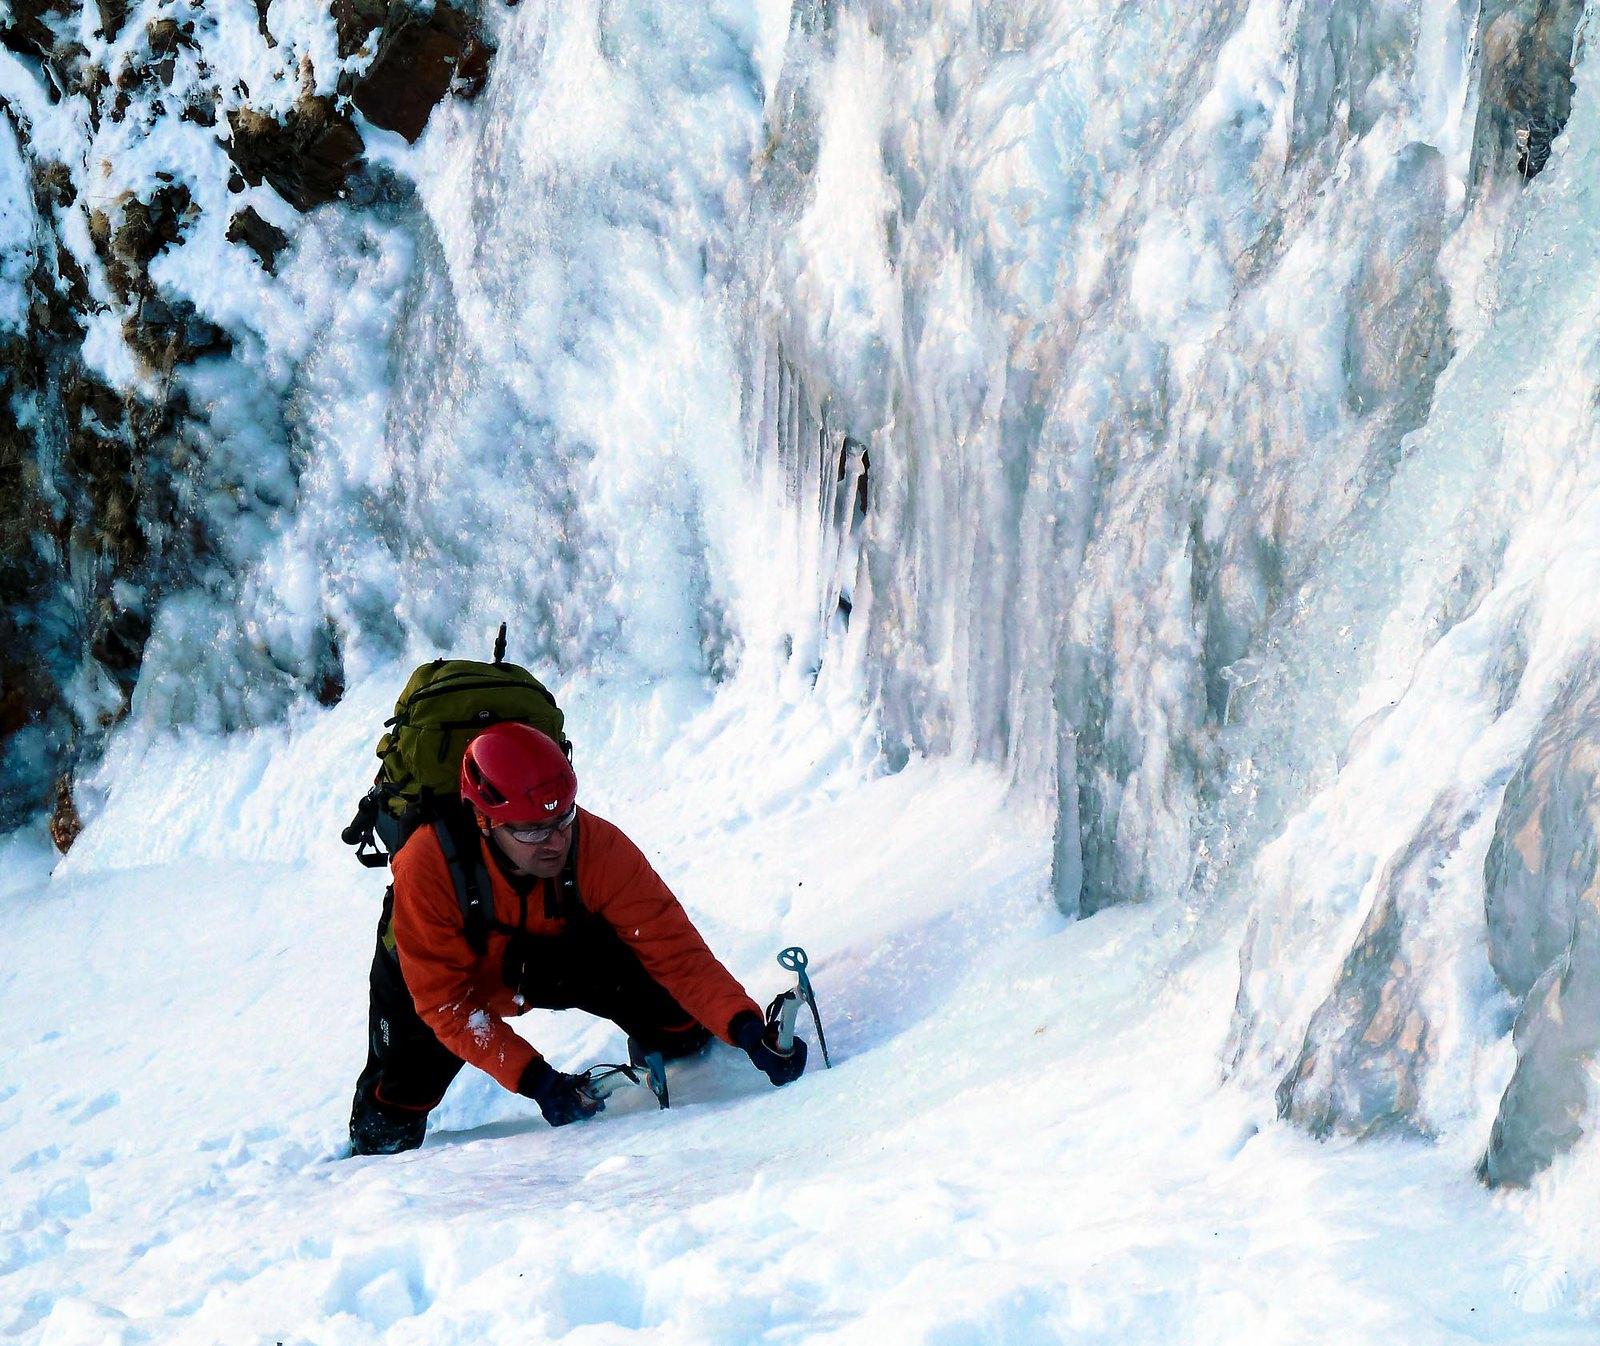 Buscando las zonas con hielo para practicar